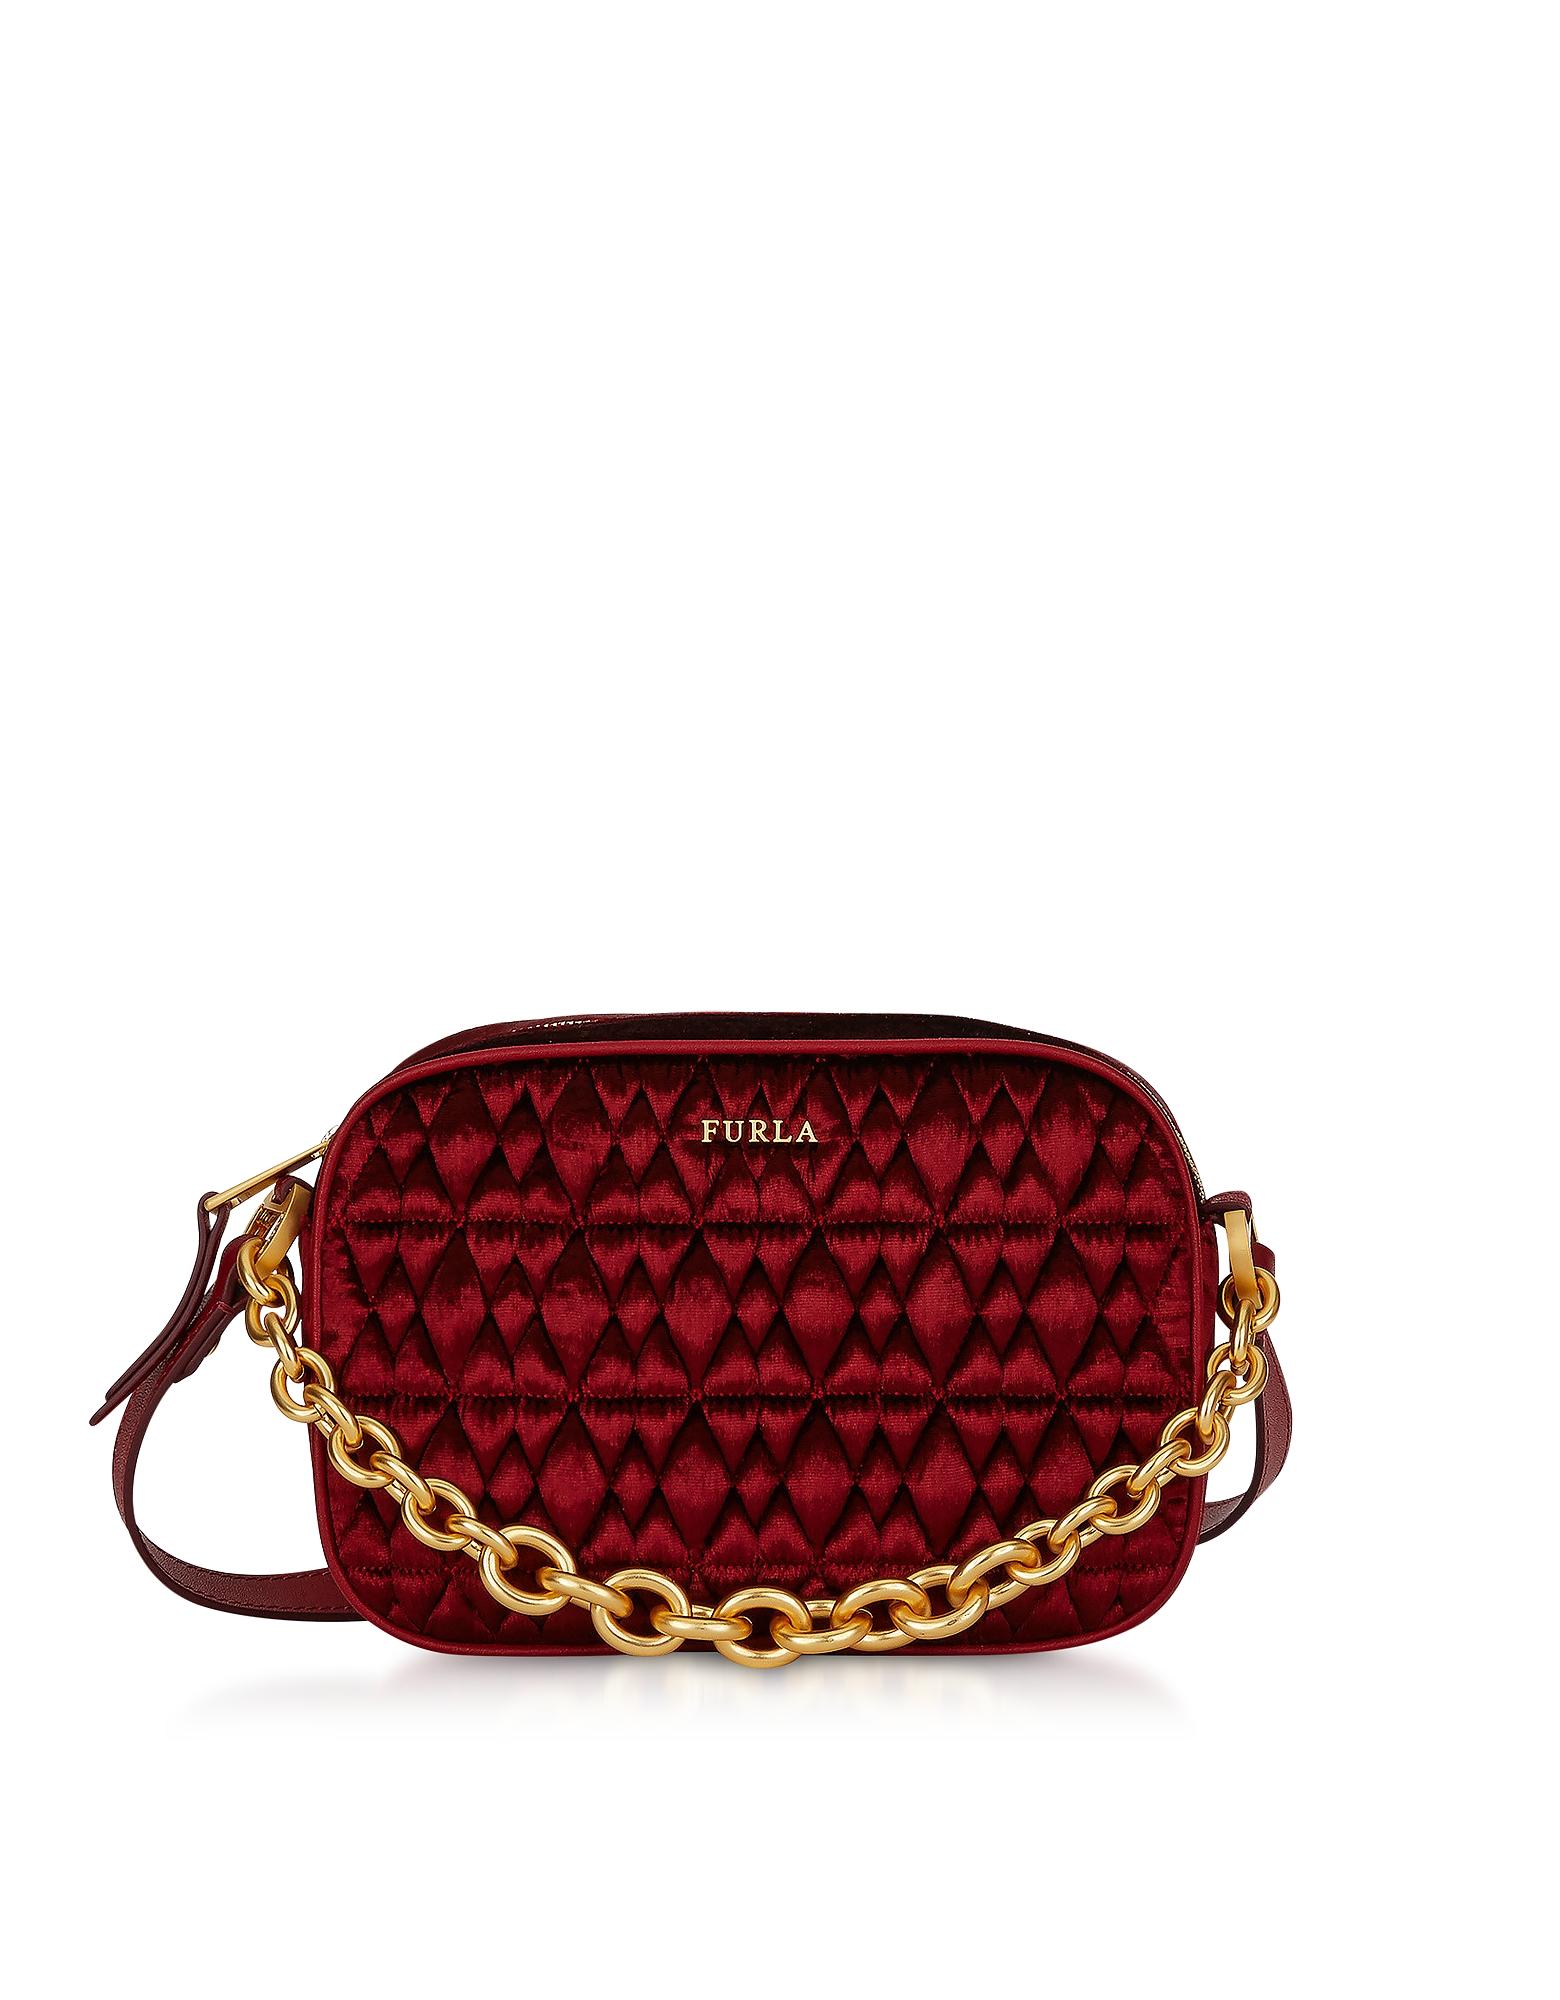 Furla Handbags, Quilted Velvet Cometa Mini Crossbody Bag